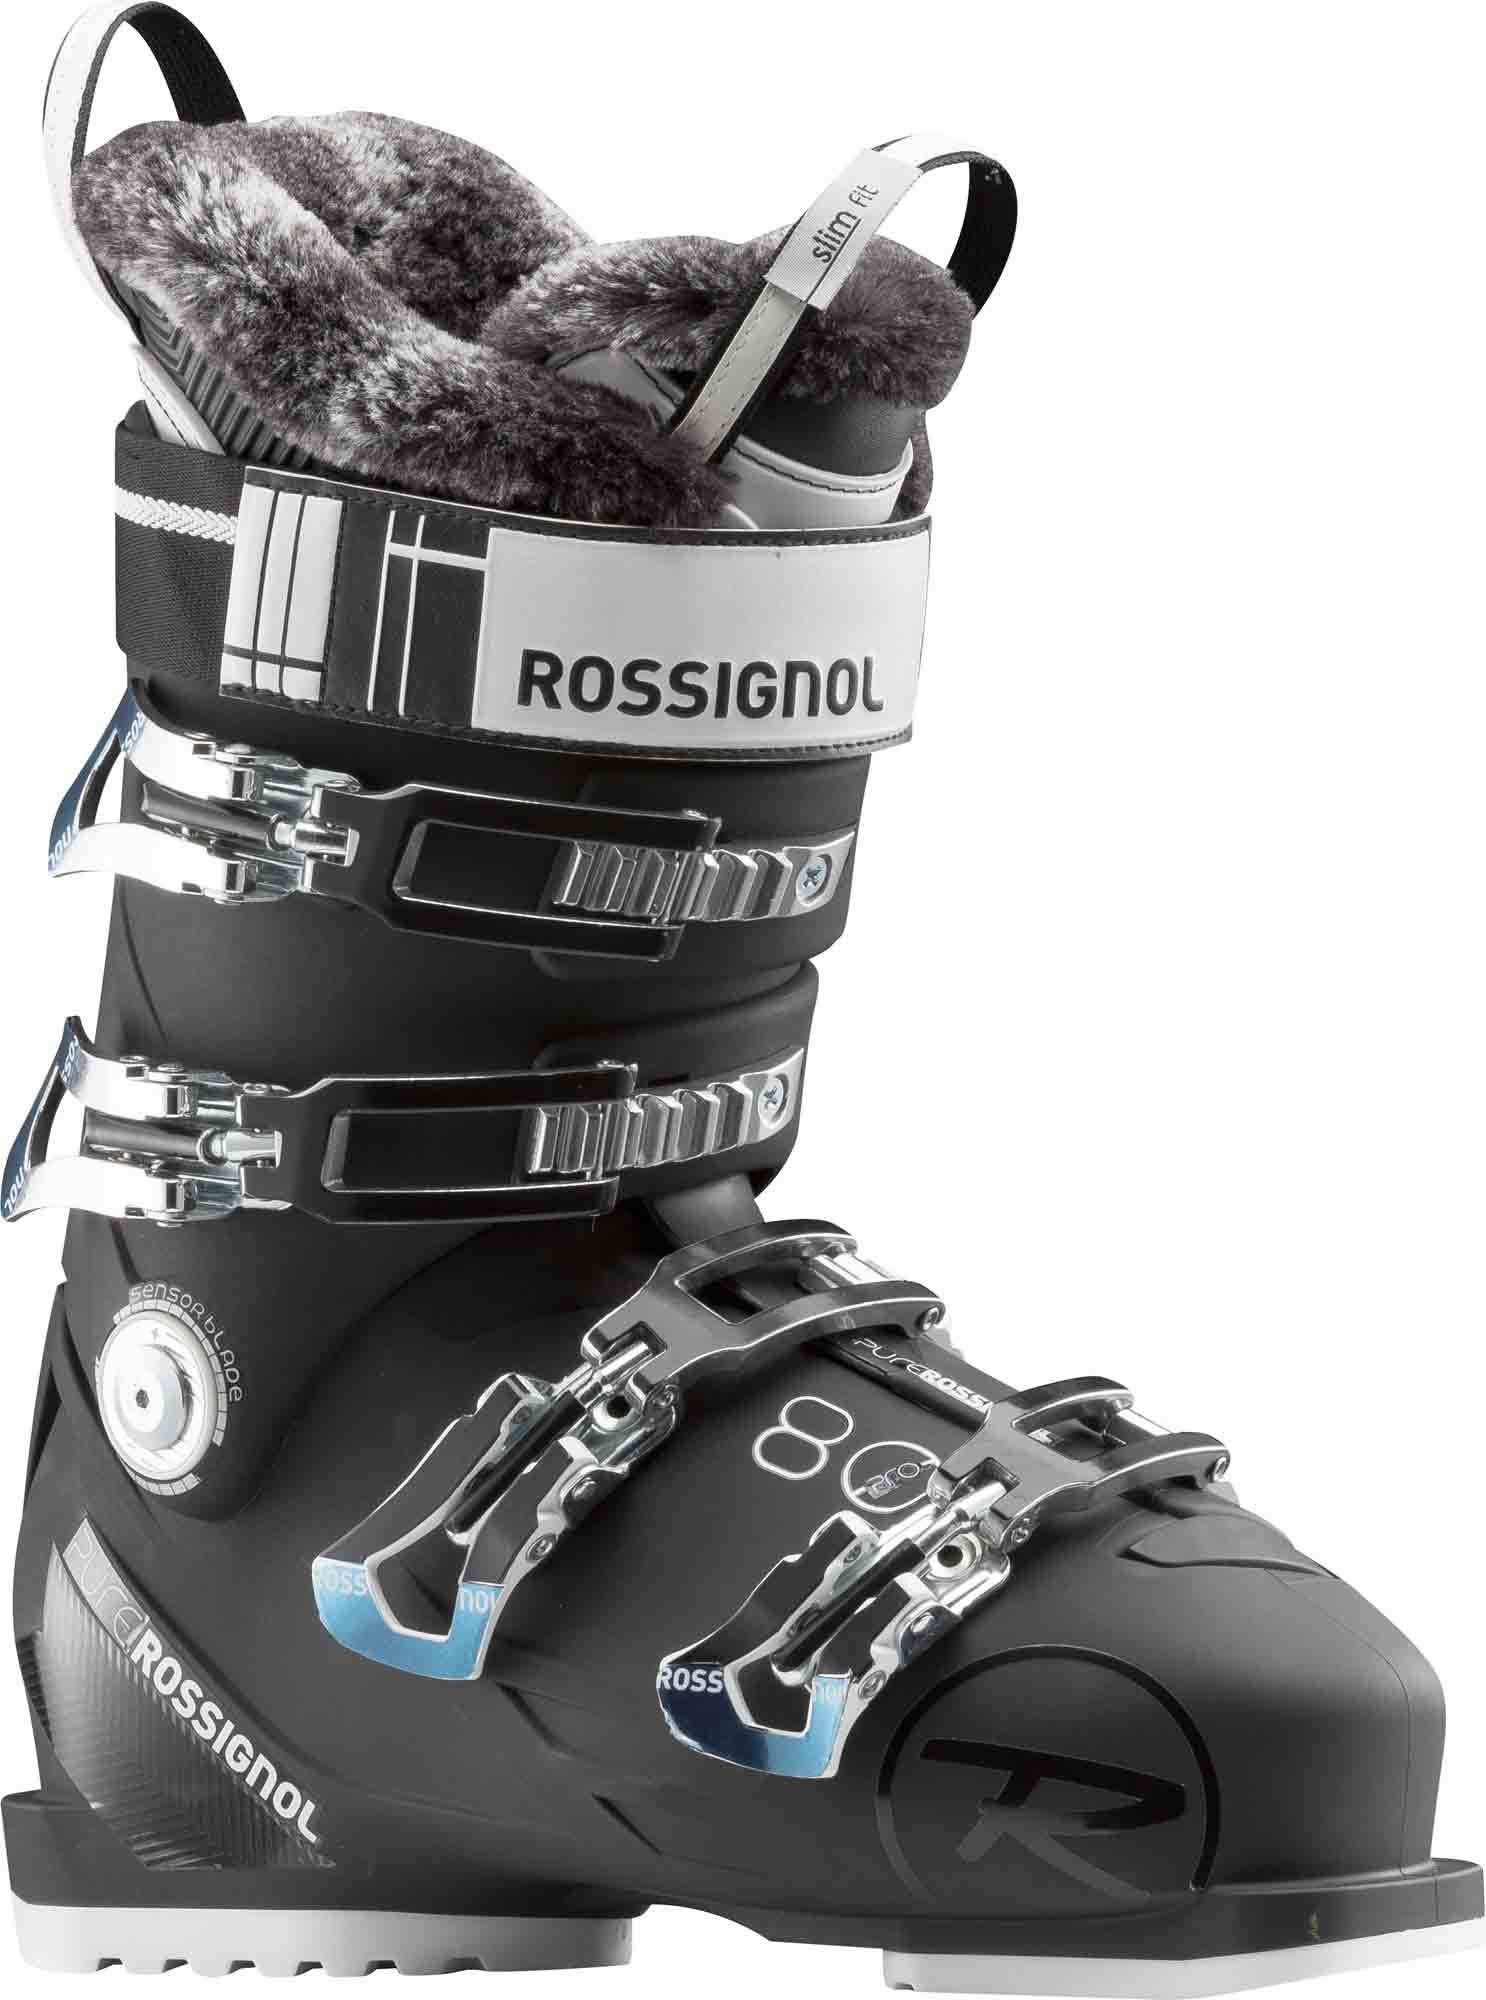 SKI Ski Chaussettes Kilimandjaro Makalu PRECISION De Noir MpqSzUV